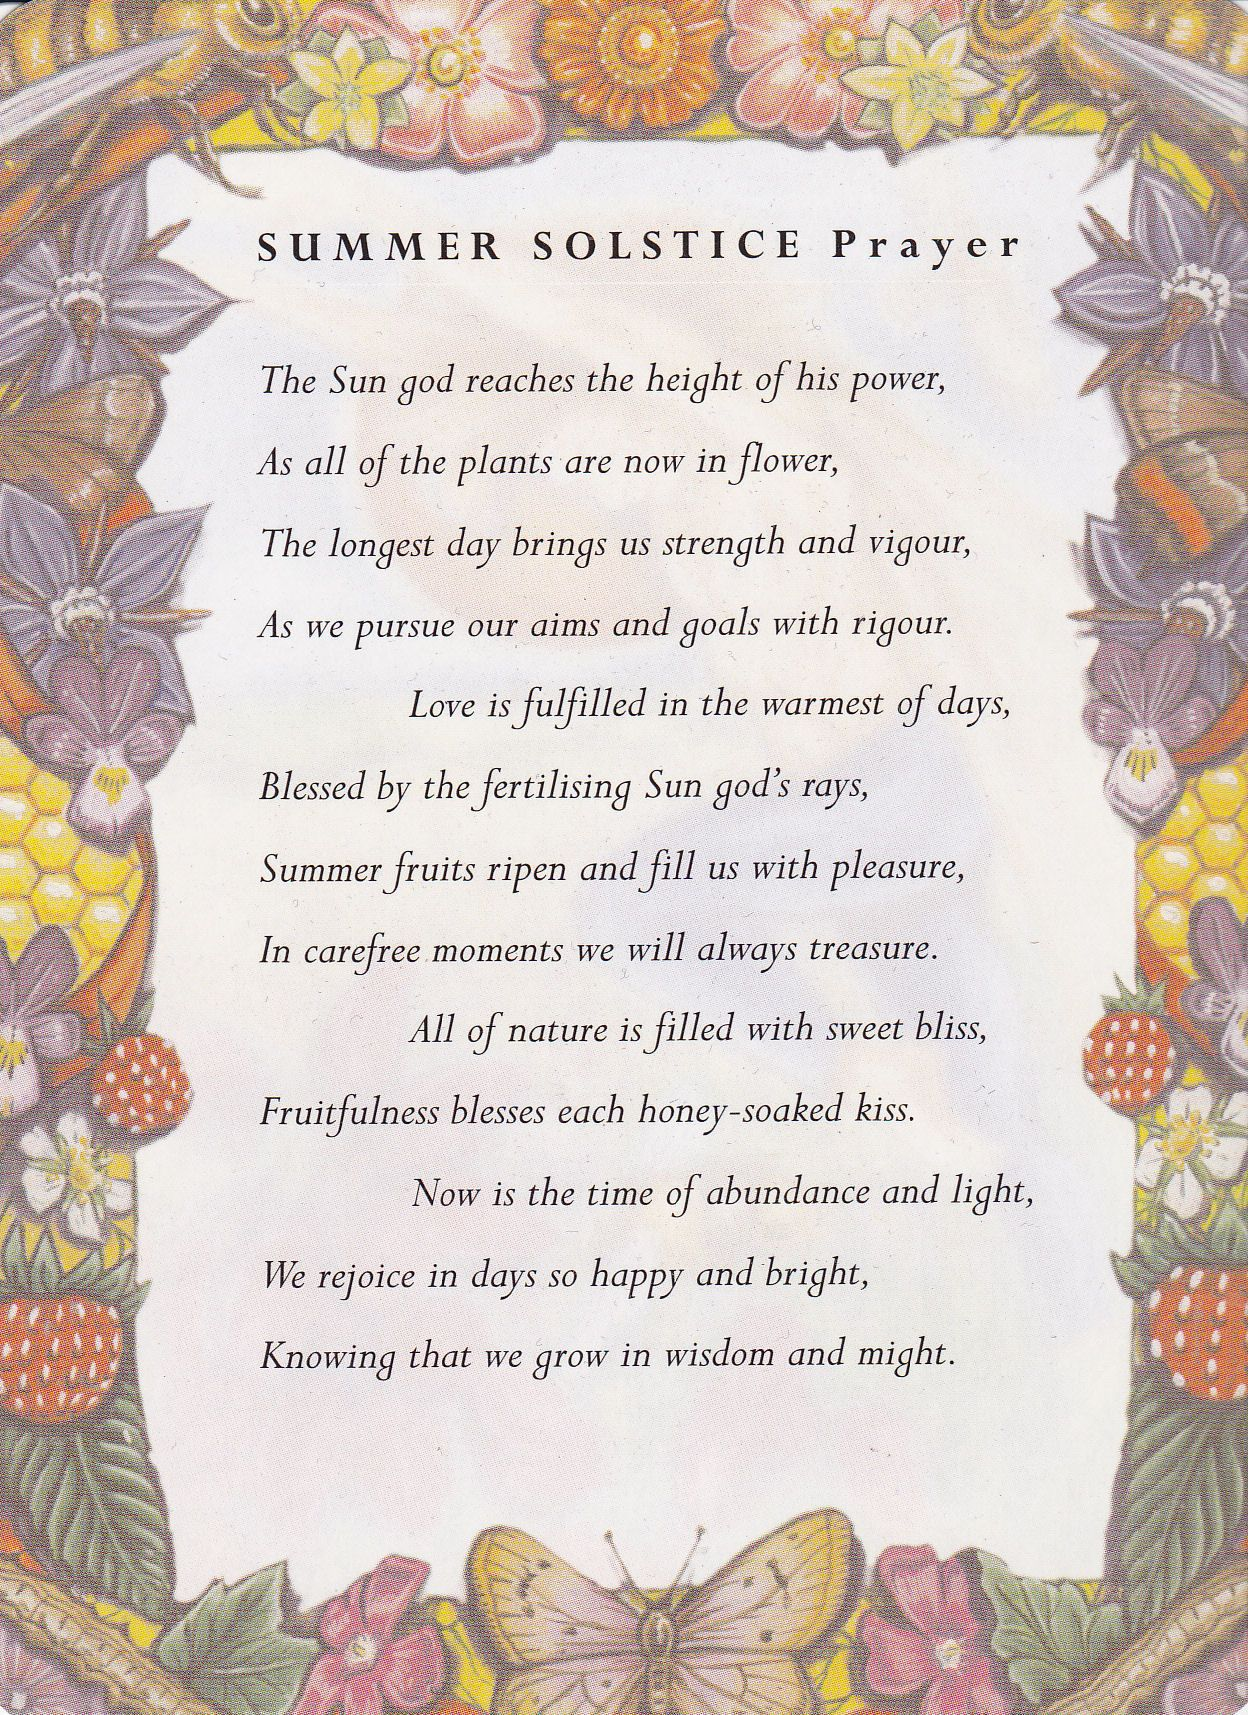 Summer Solstice Summer Solstice Prayer Summer